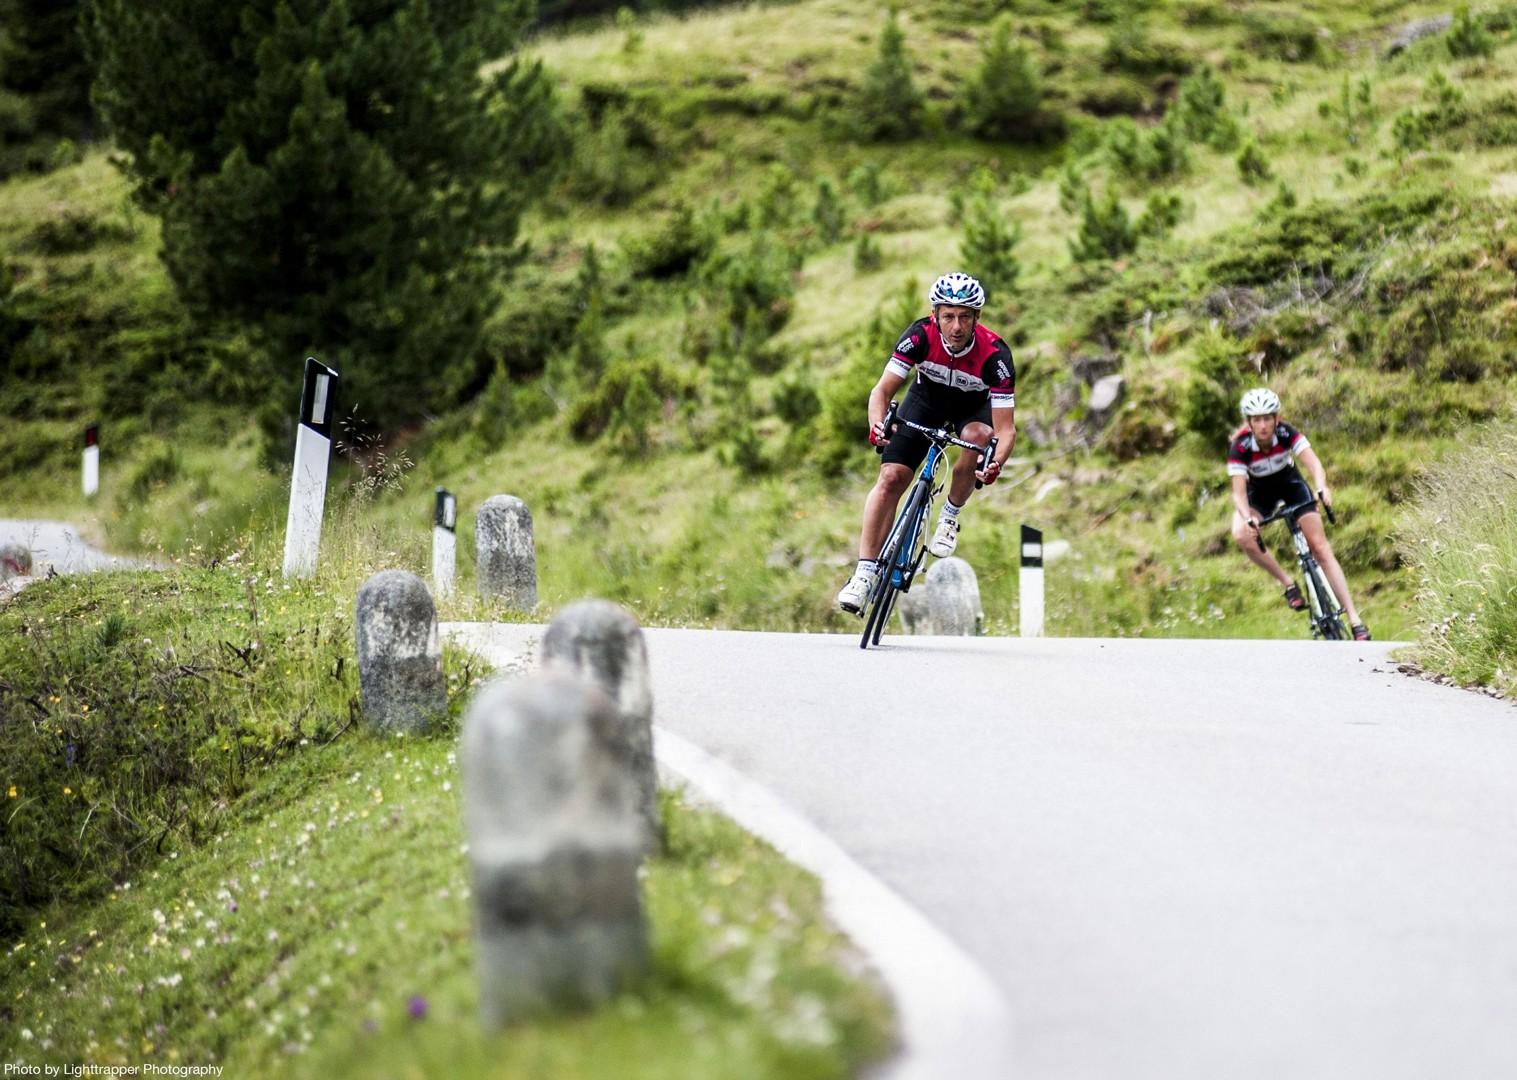 italian-alps-gavia-guided-road-cycling-holiday.jpg - Italy - Italian Alps - Guided Road Cycling Holiday - Road Cycling